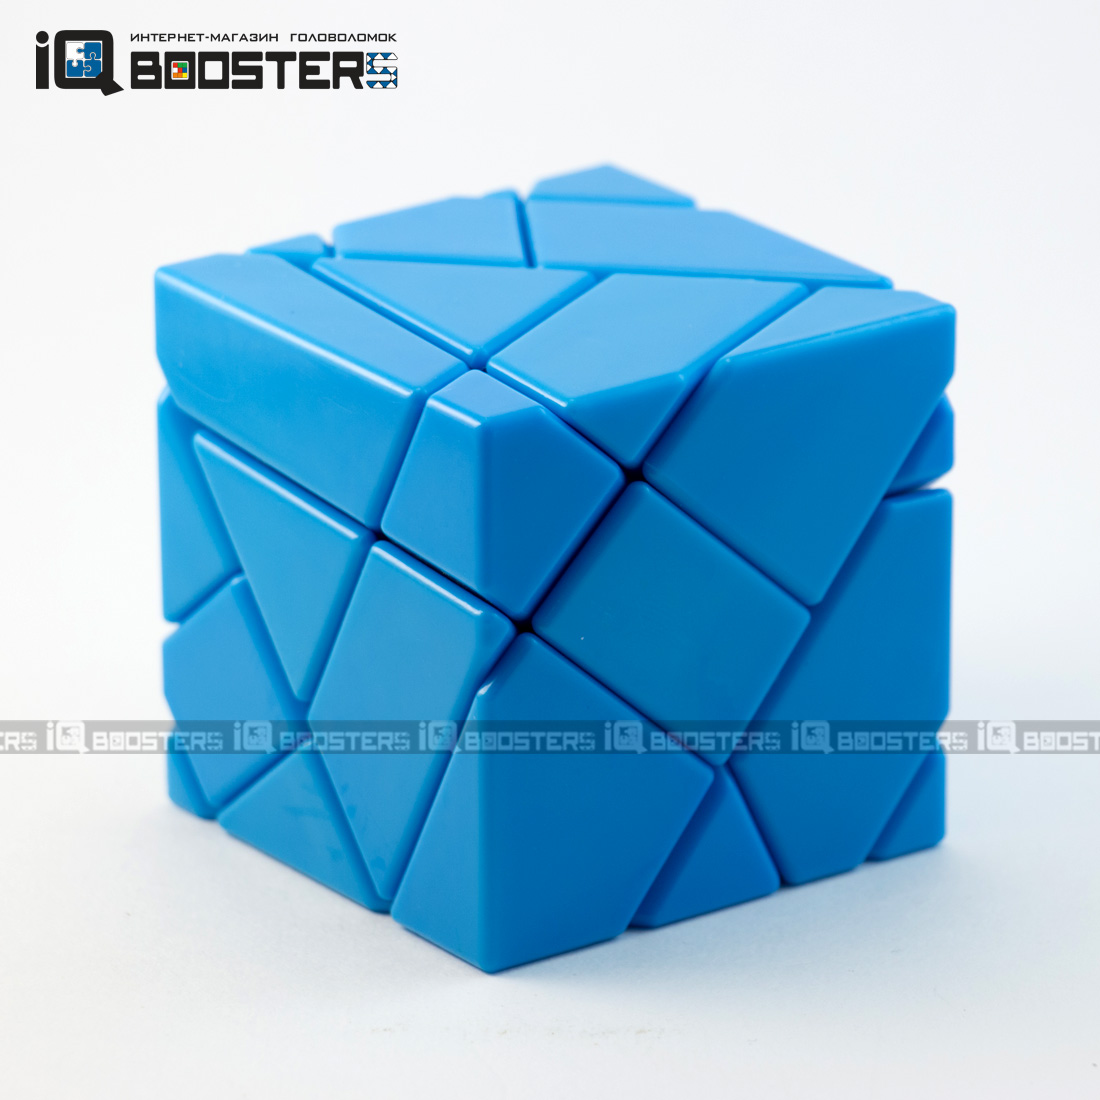 ninja_ghost_cube_7bl